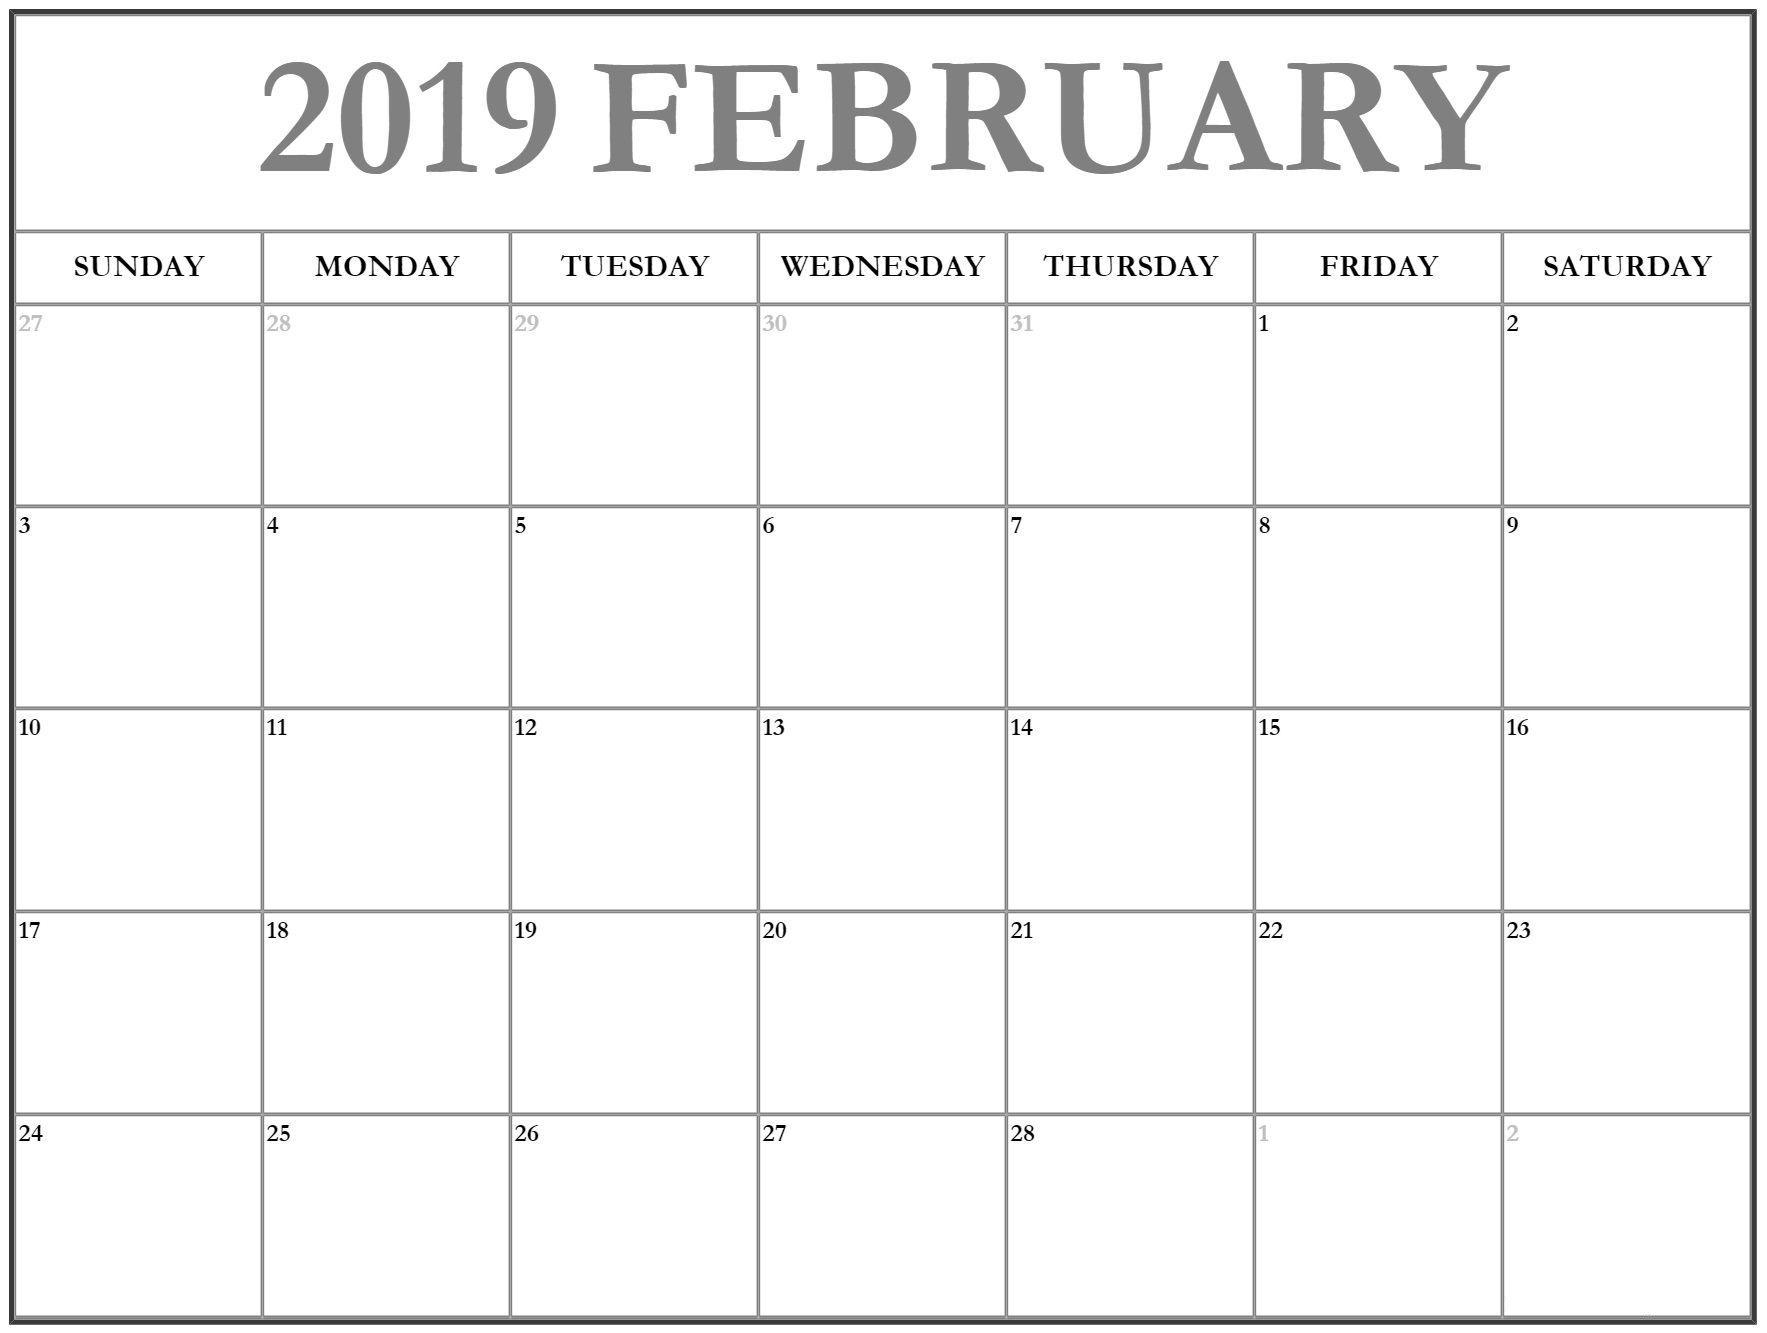 February Calendar 2019 Dates Planner February Calendar 2019 Manage